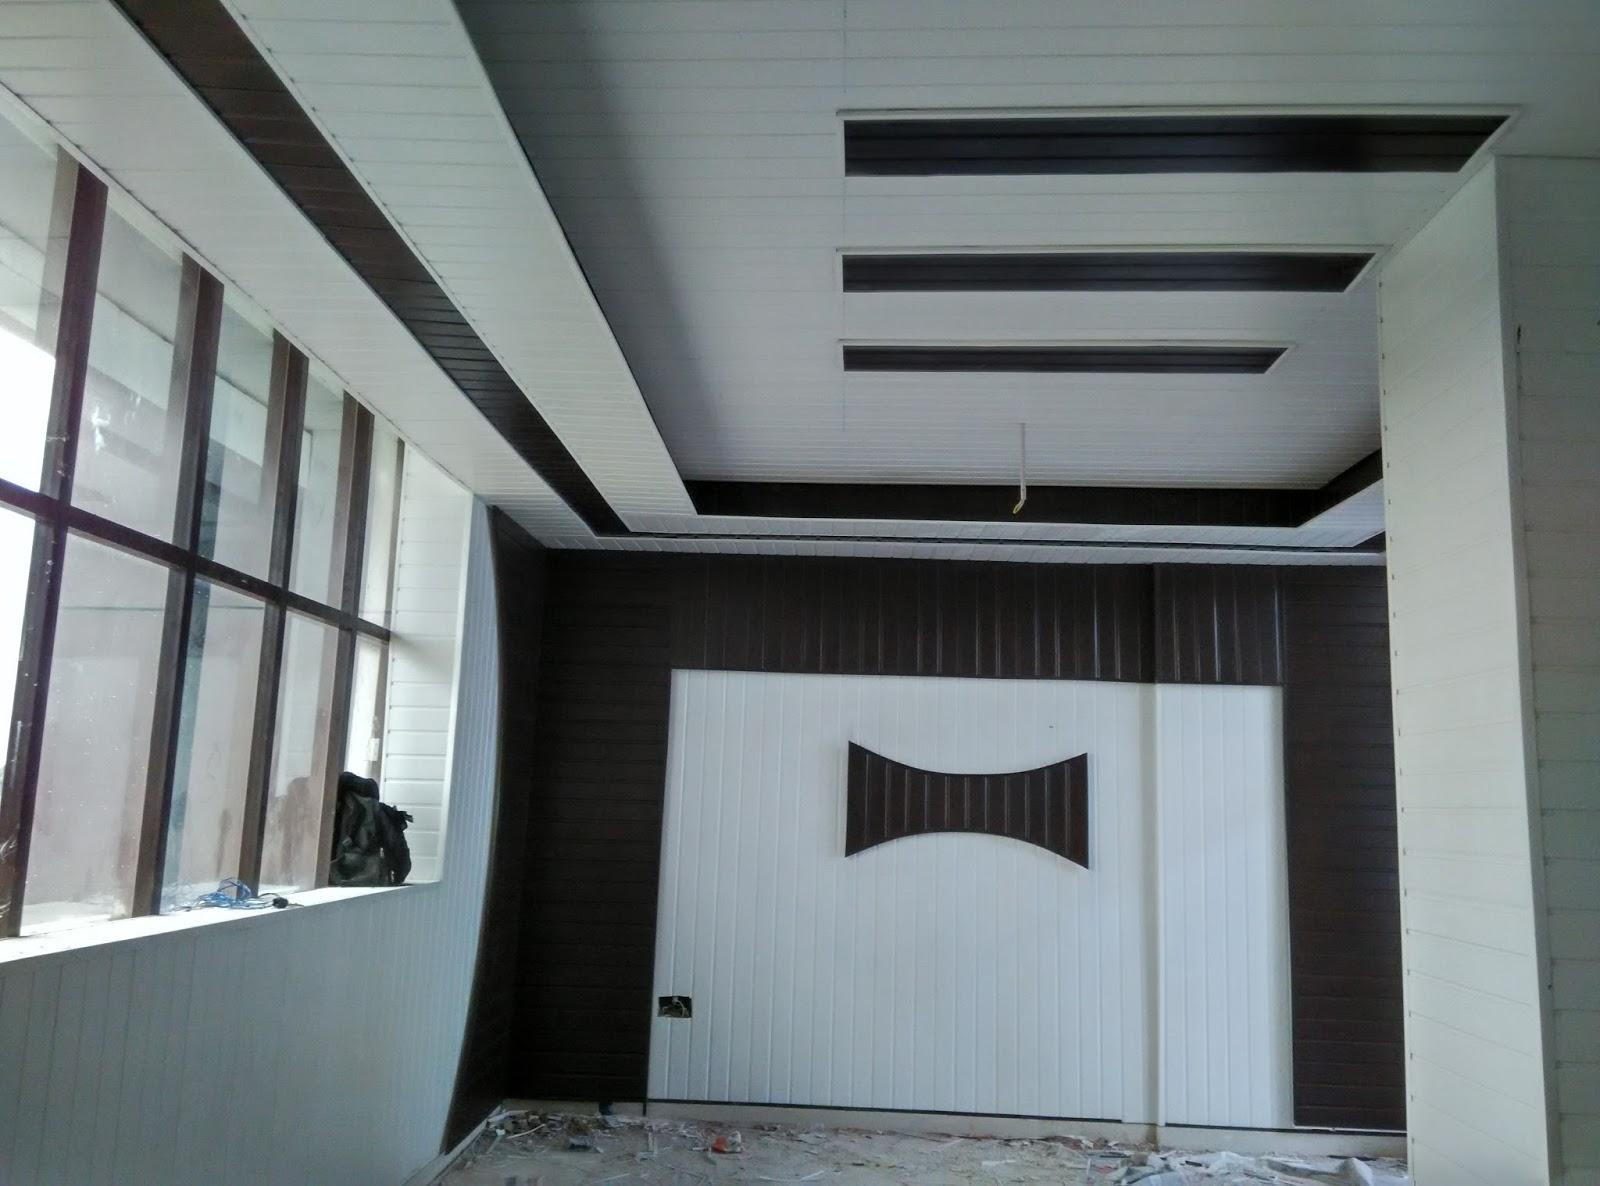 Decorative Plastic Sheets - Wall Decor